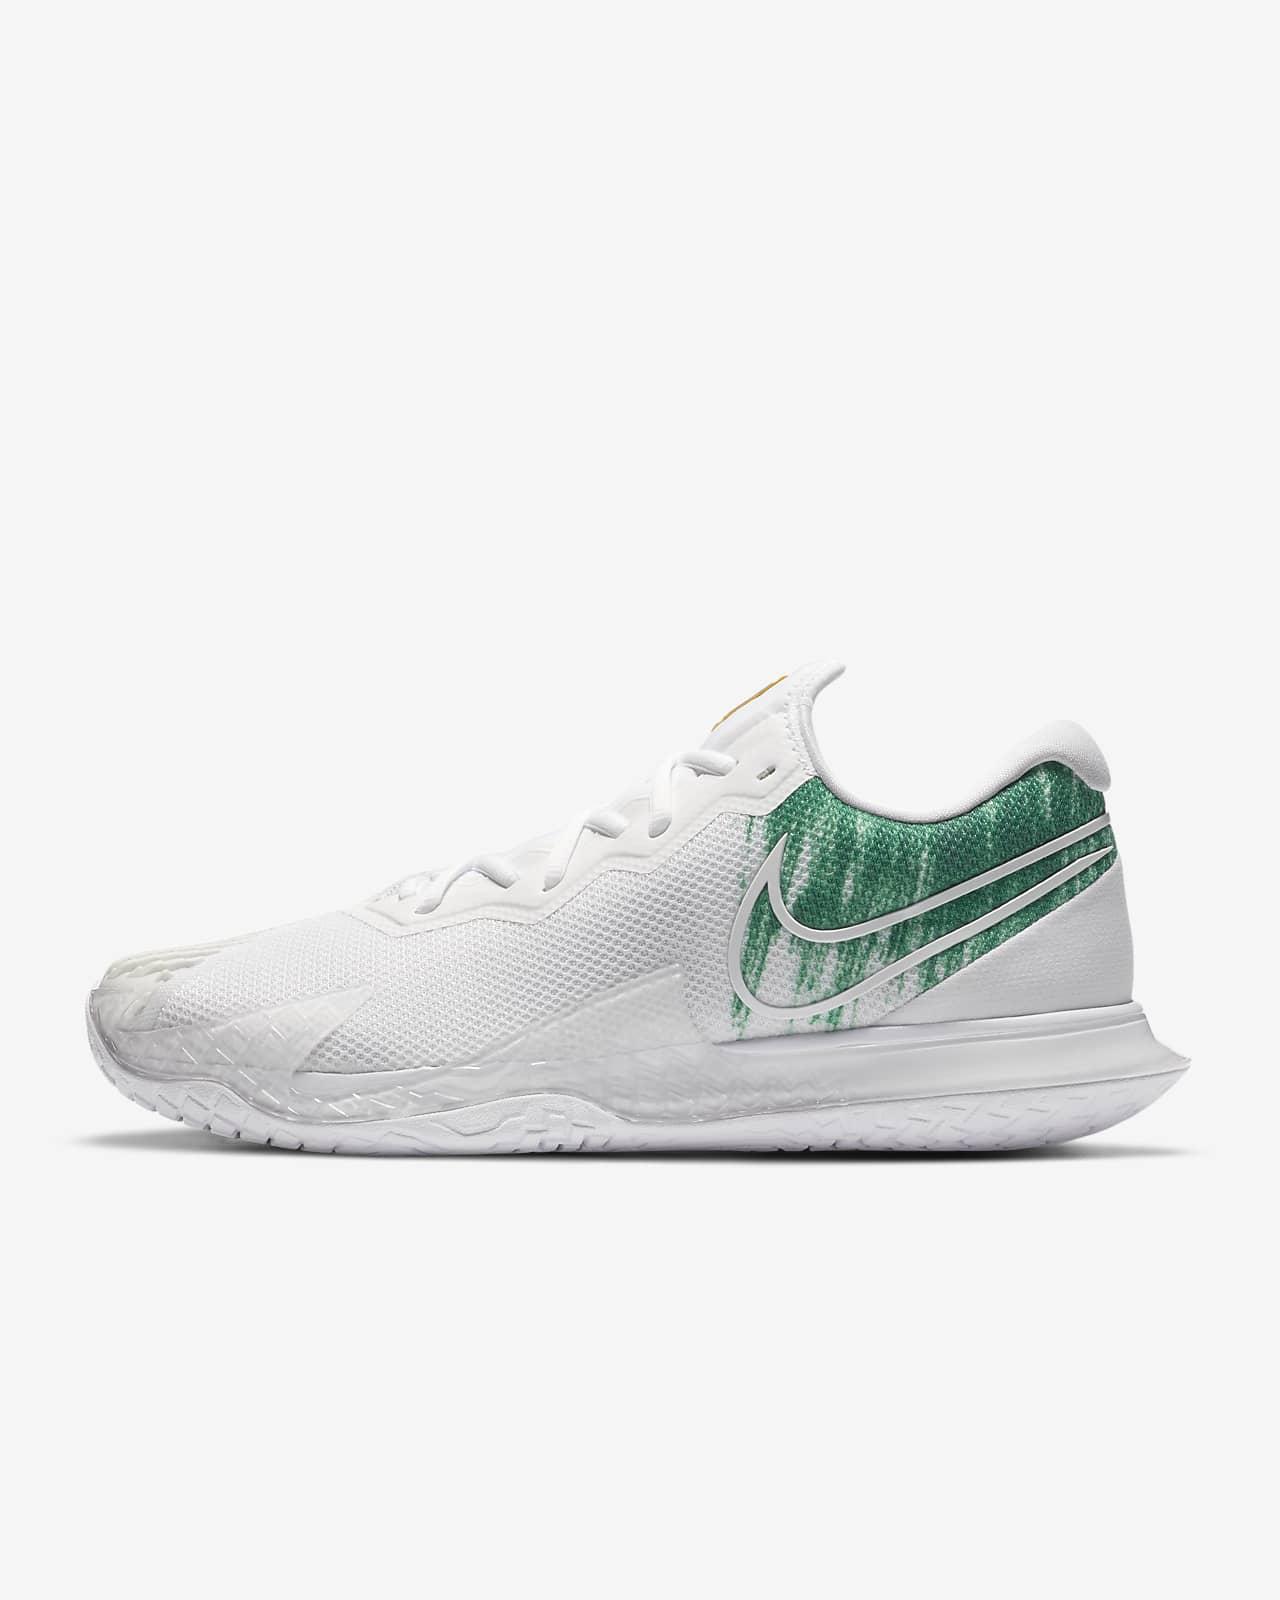 NikeCourt Air Zoom Vapor Cage 4 Men's Hard Court Tennis Shoes. Nike JP